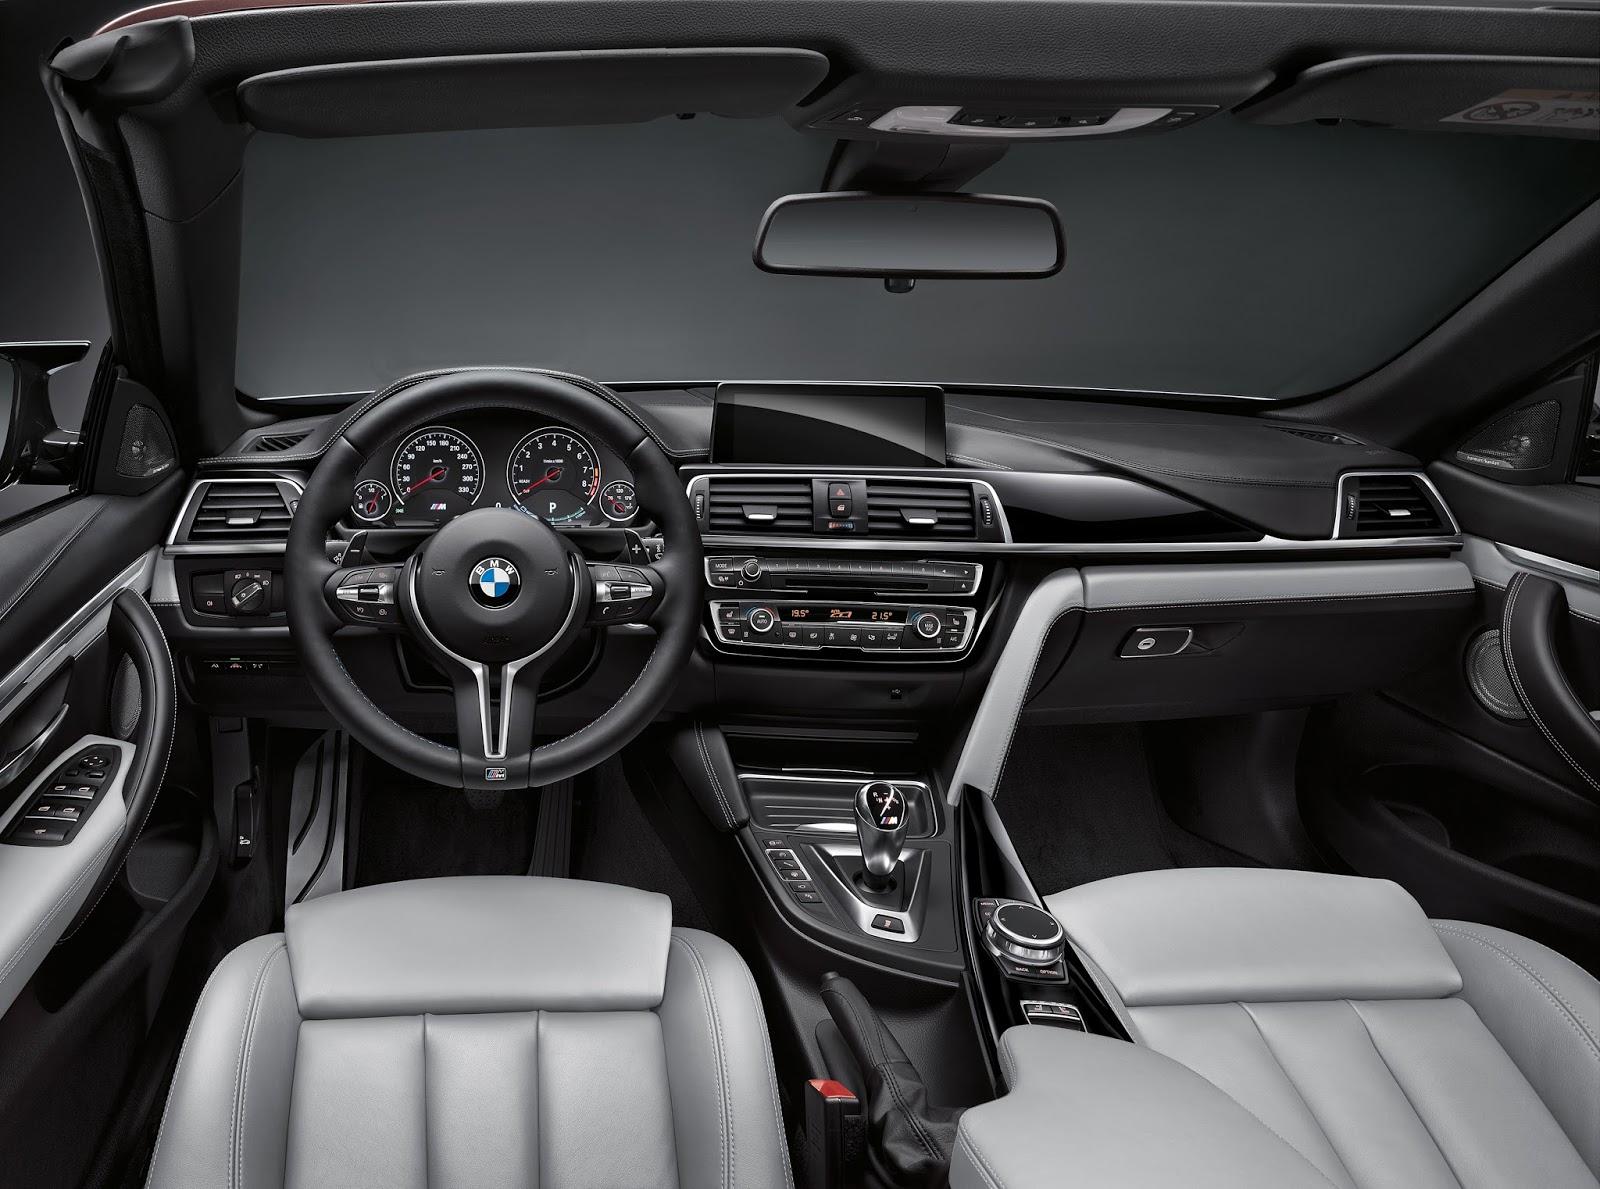 P90244970 highRes bmw m4 convertible 0 Η νέα BMW Σειρά 4, με πιο σφιχτή ρύθμιση ανάρτησης BMW, Bmw 4, BMW 4 Cabrio, BMW 4 Coupe, BMW 4 Gran Coupé, Facelift